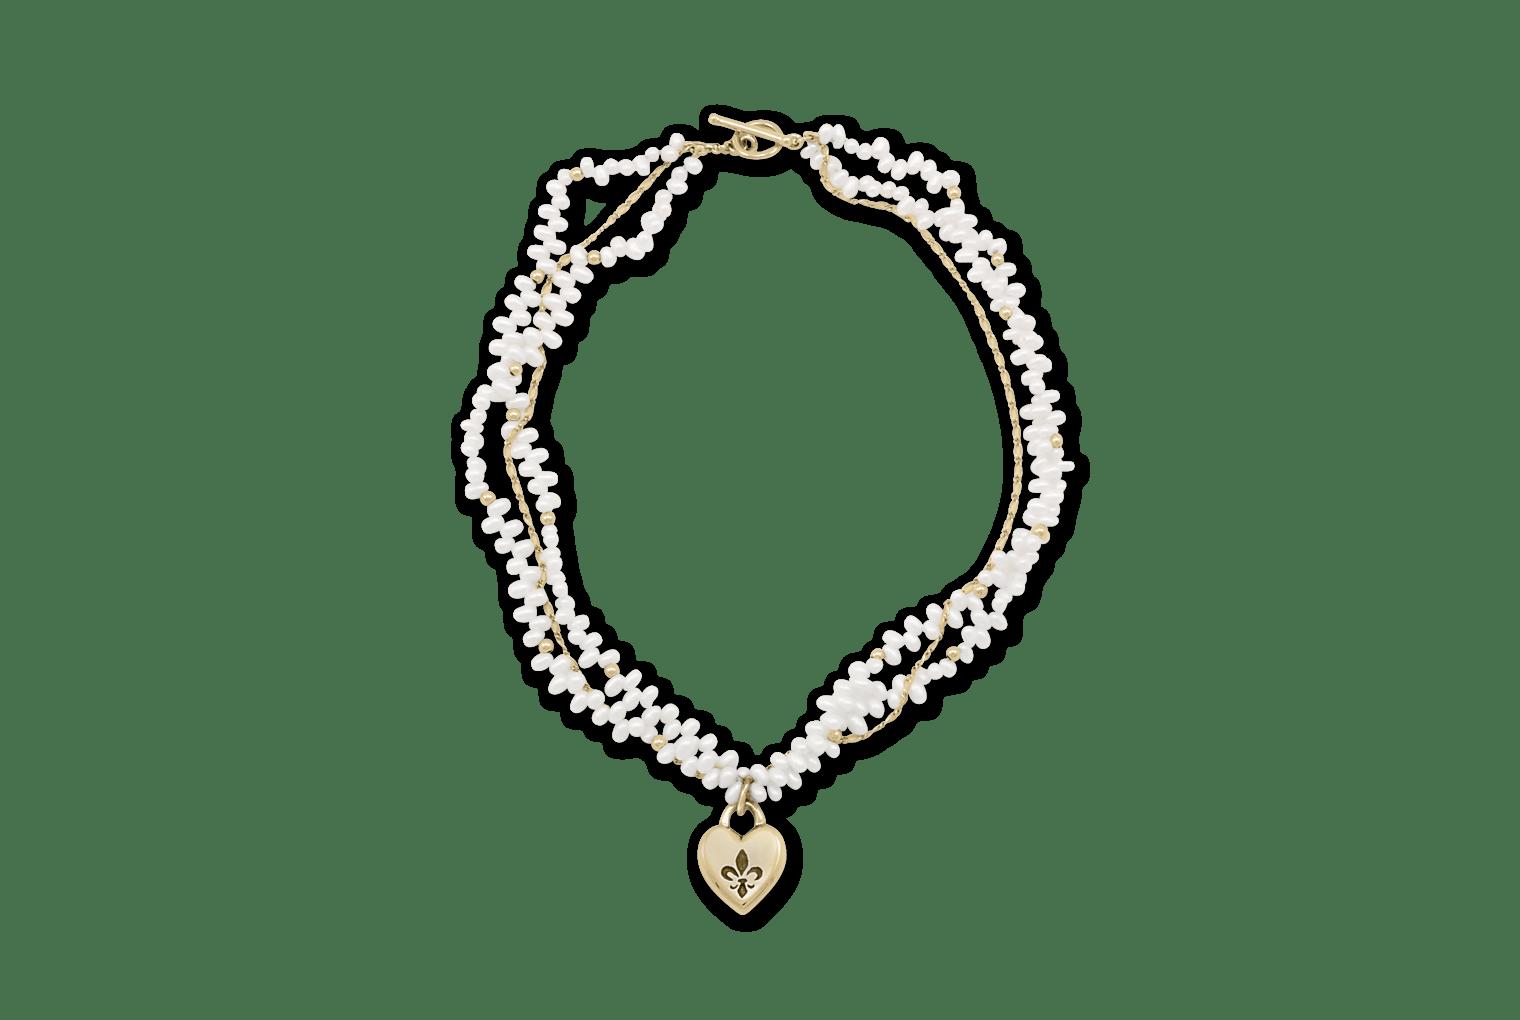 Fleur De Lis Intaglio Heart Pearl Necklace Mignon Faget